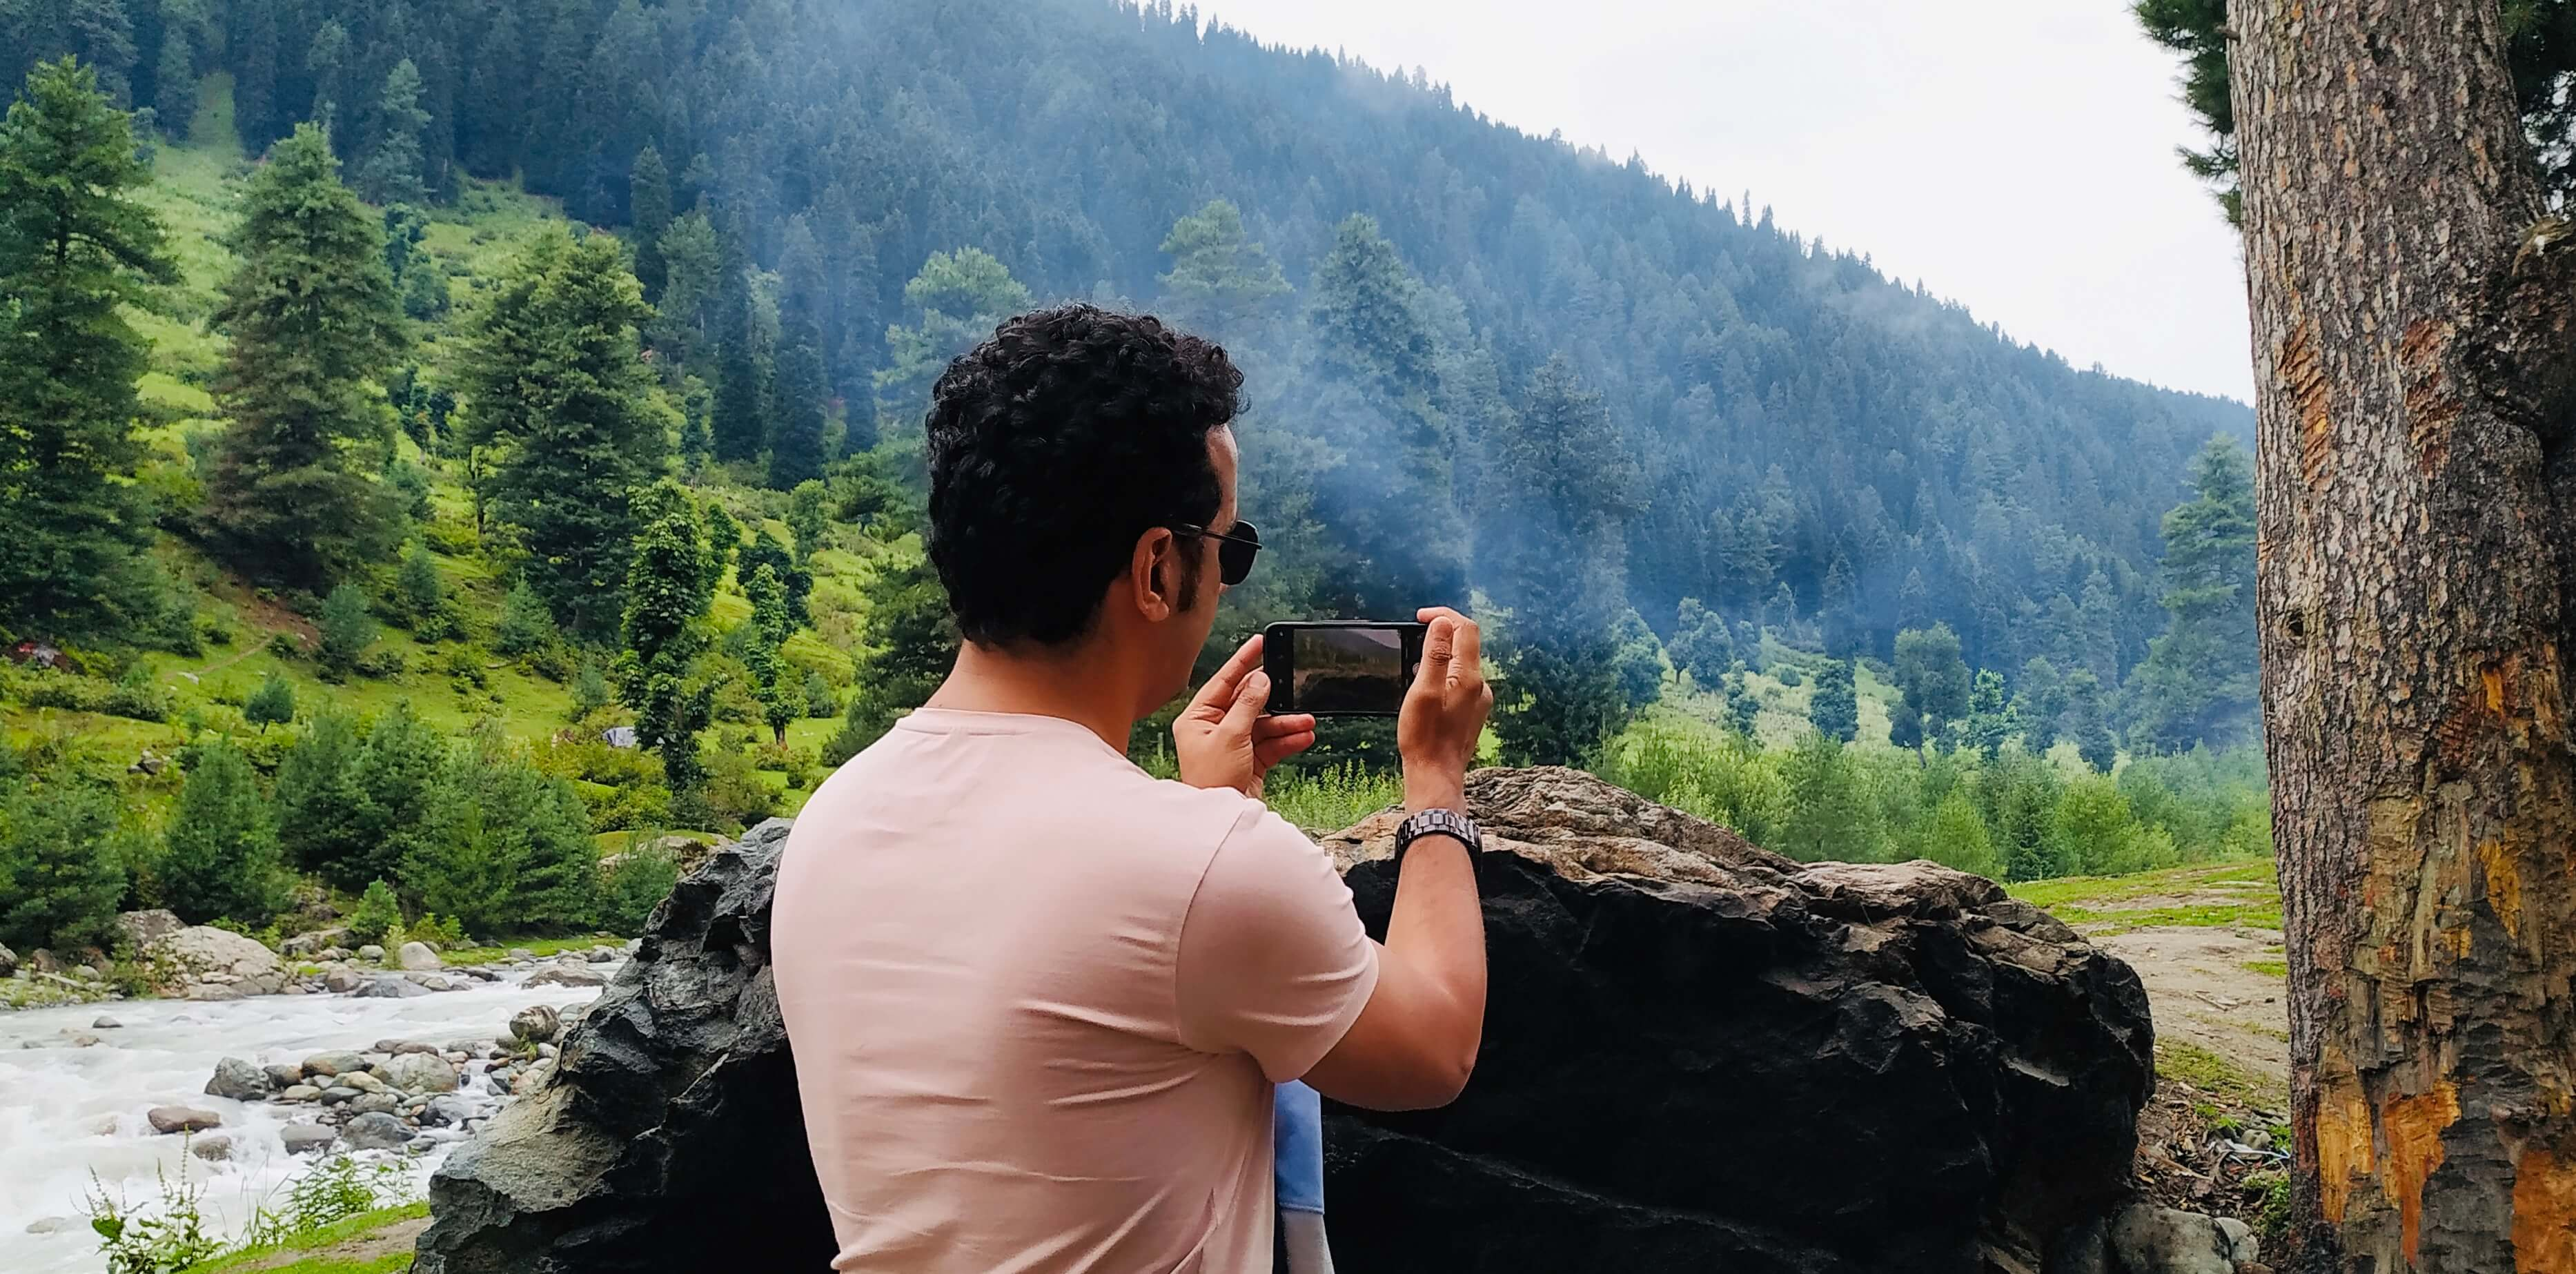 Star turn: From Kashmiri engineering grad to filmmaker